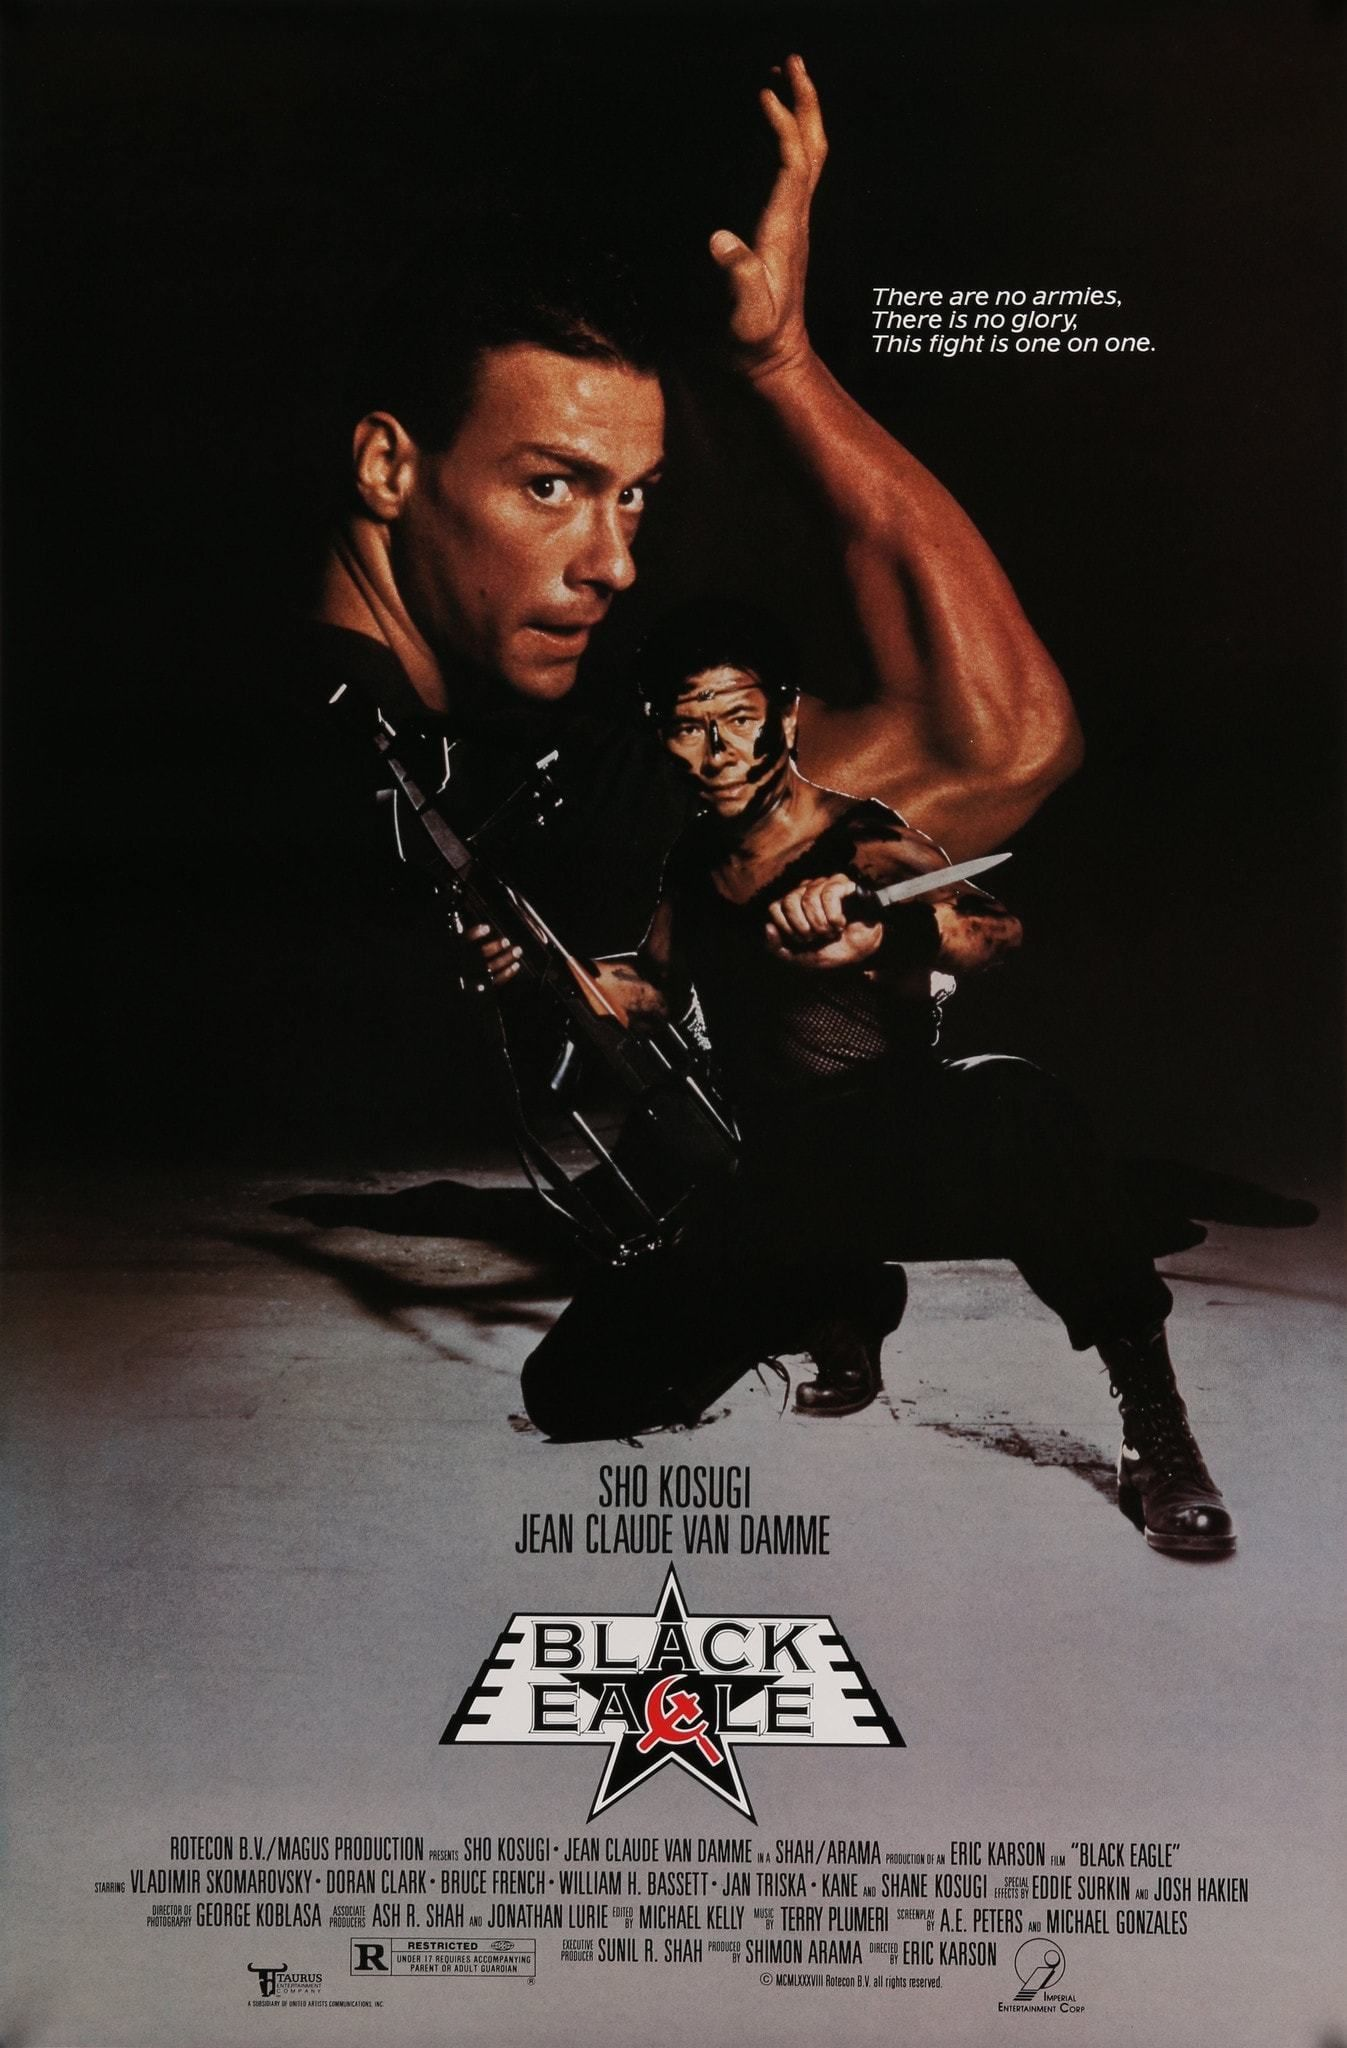 Black Eagle 1988 Jean Claude Van Damme Van Damme Black Eagle